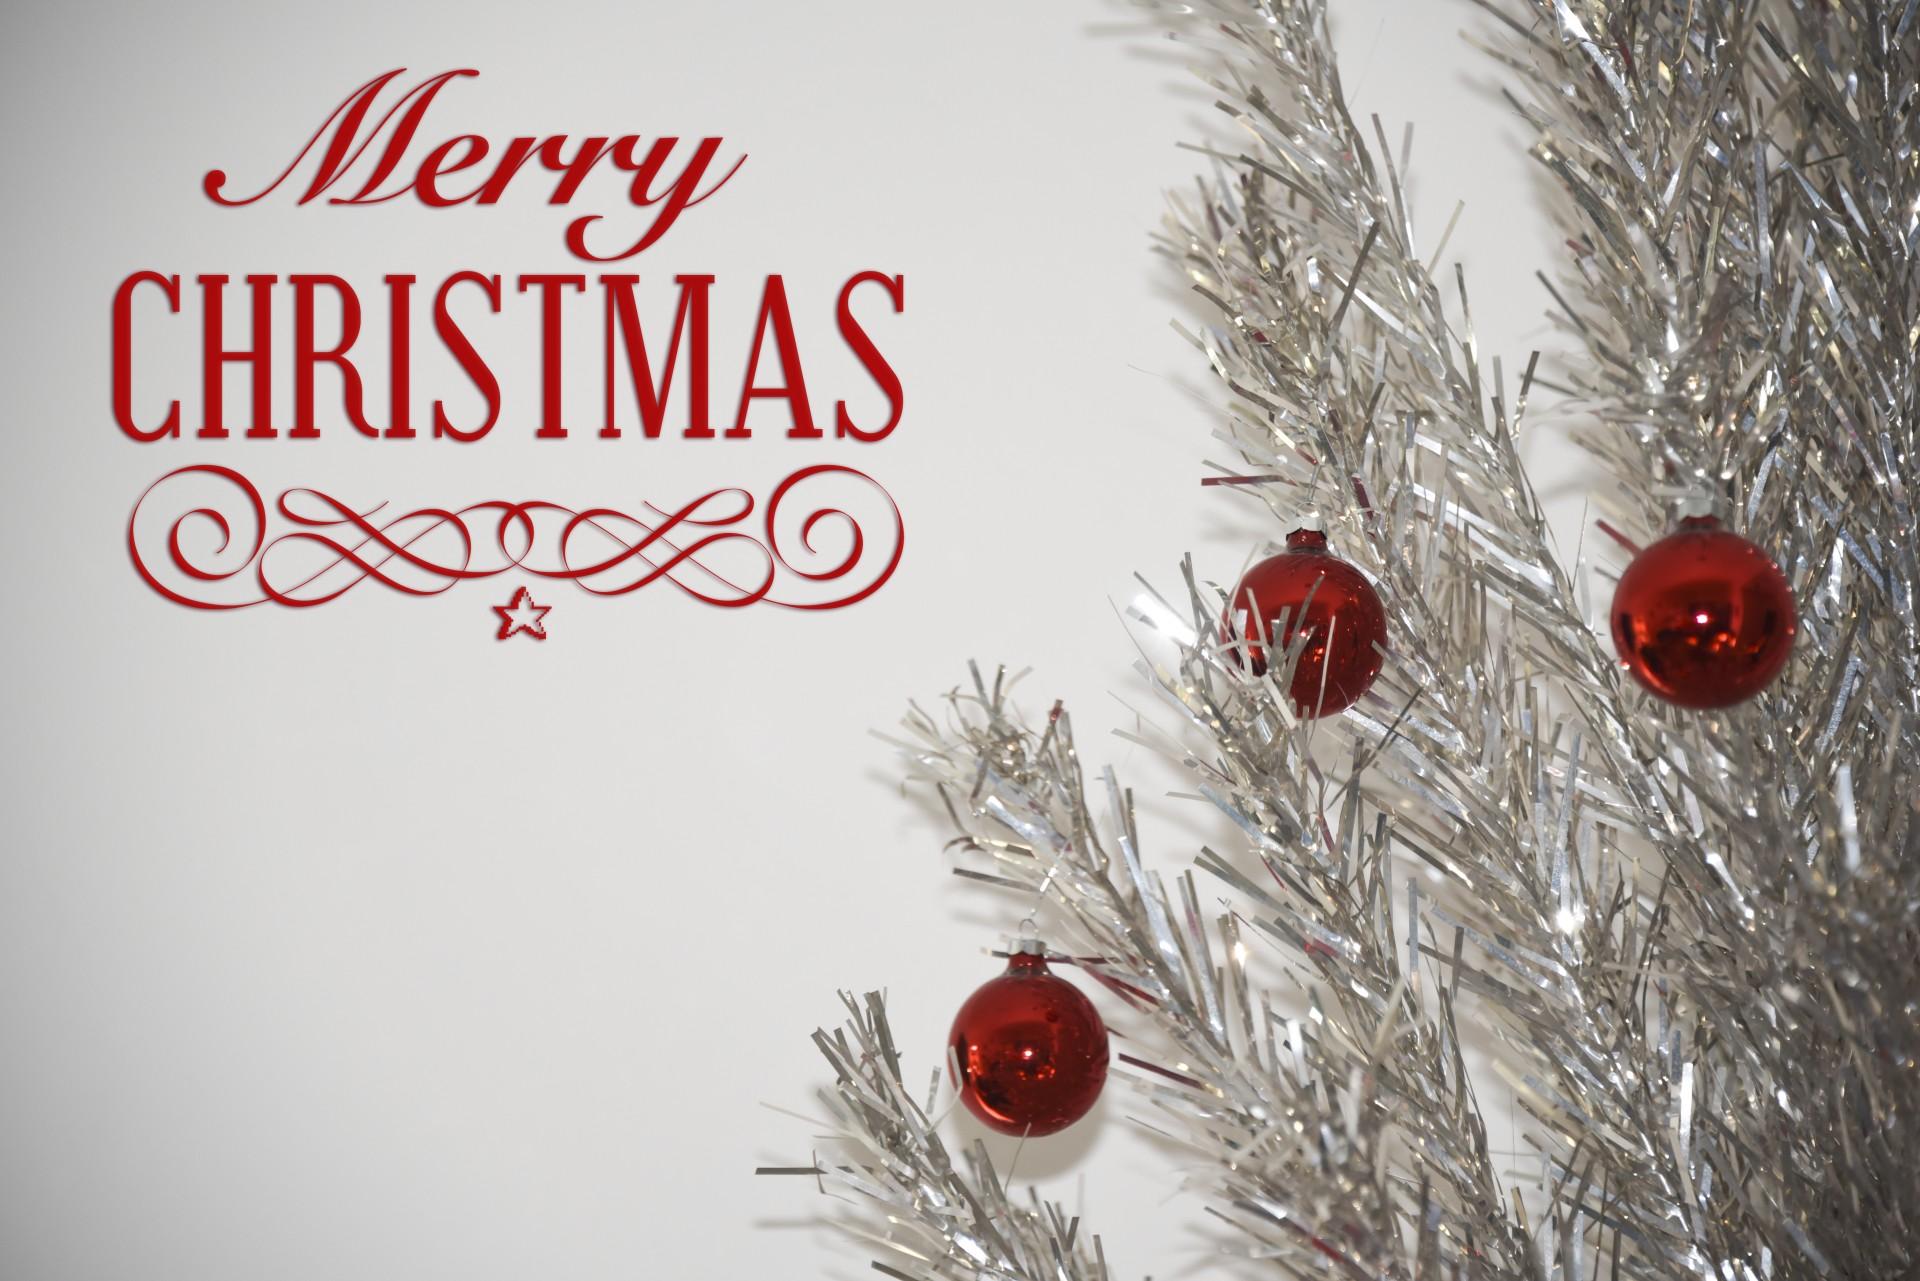 Christmas Greeting Tree Free Stock Photo Public Domain